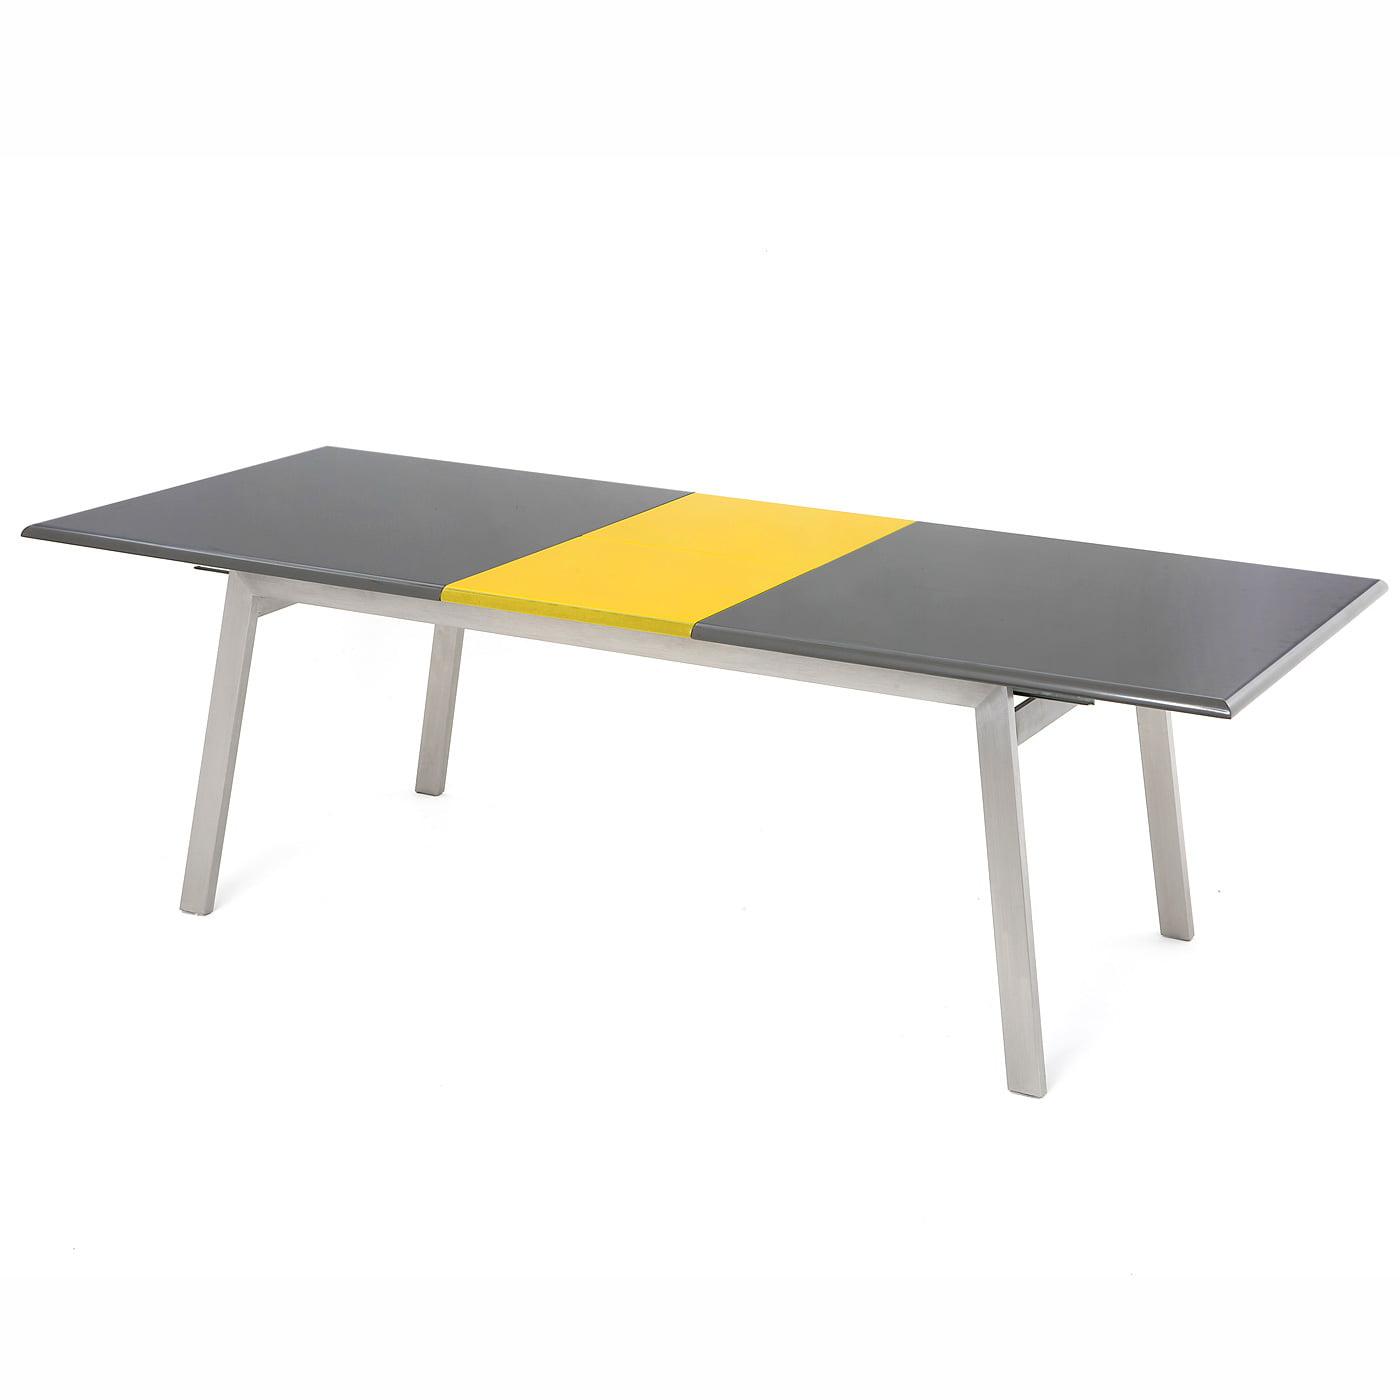 Coffee Table Extendable Legs: Vestina Extendable Grey/Yellow High Gloss Table